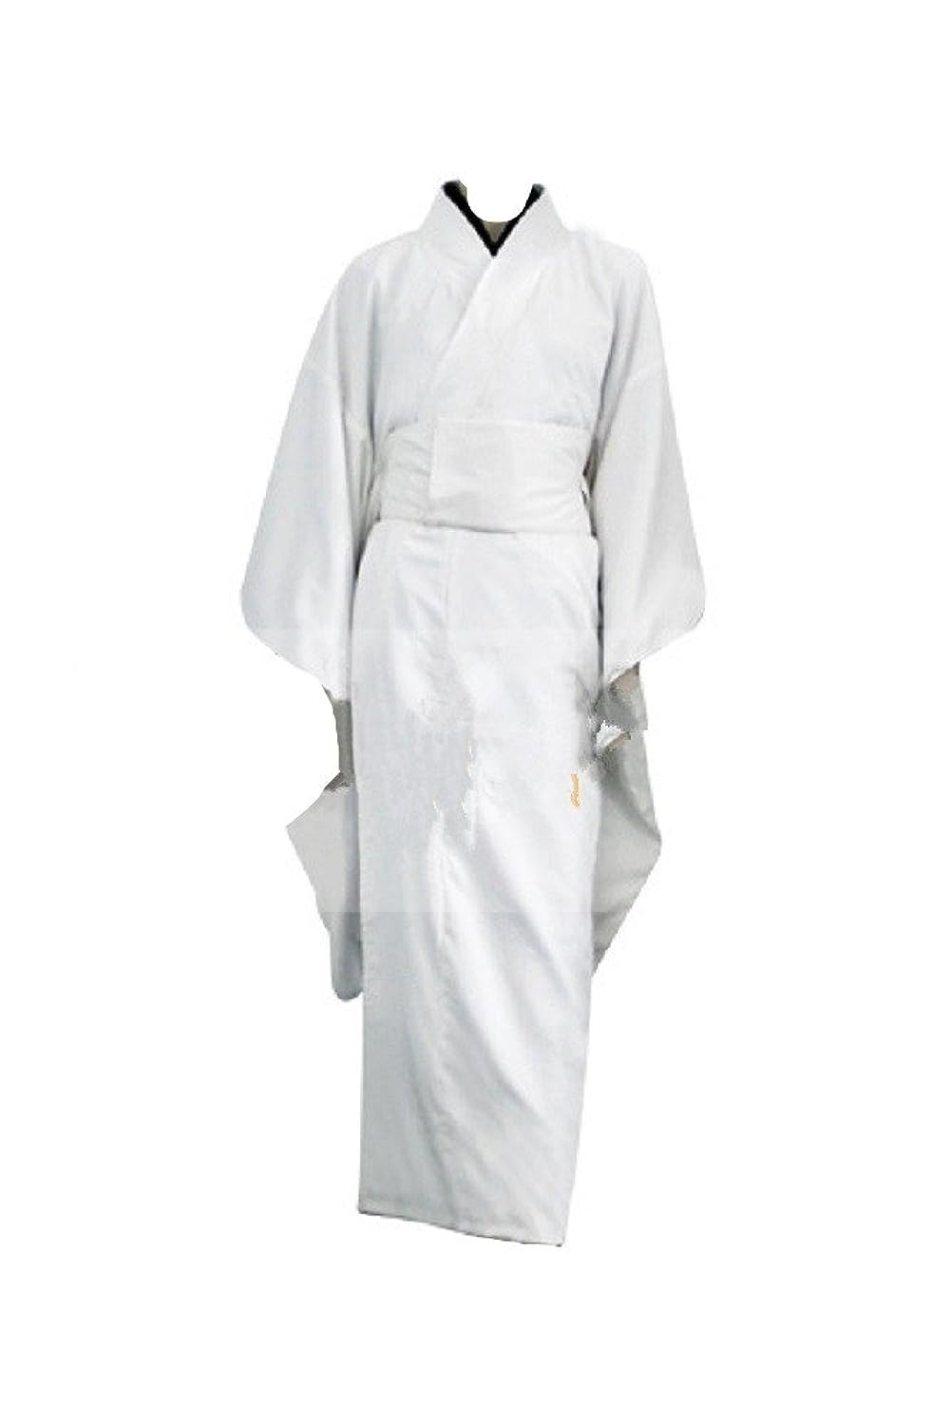 Kill Bill O-Ren Ishii Kimono Girl's Cosplay Costume